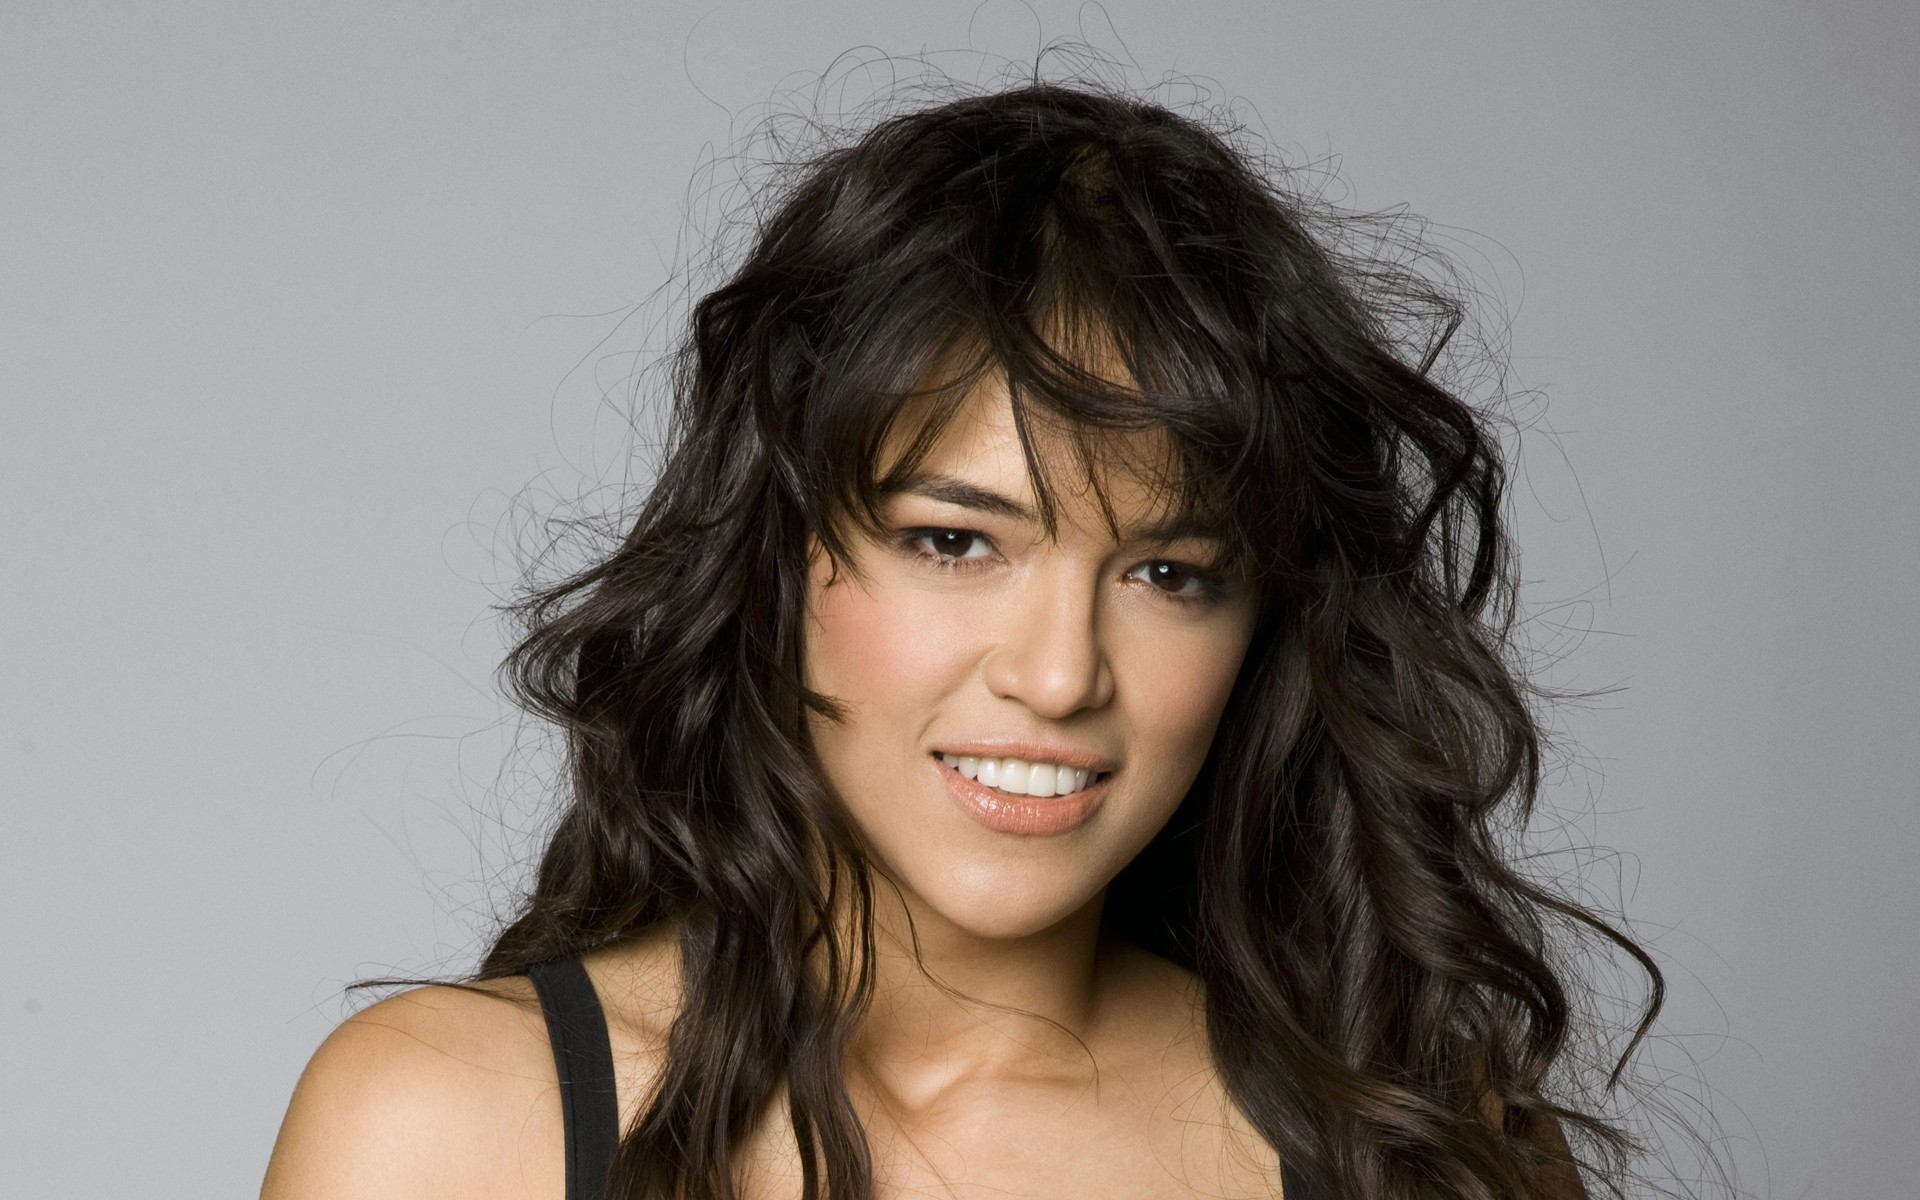 Michelle Rodriguez 2013 - 1920x1200